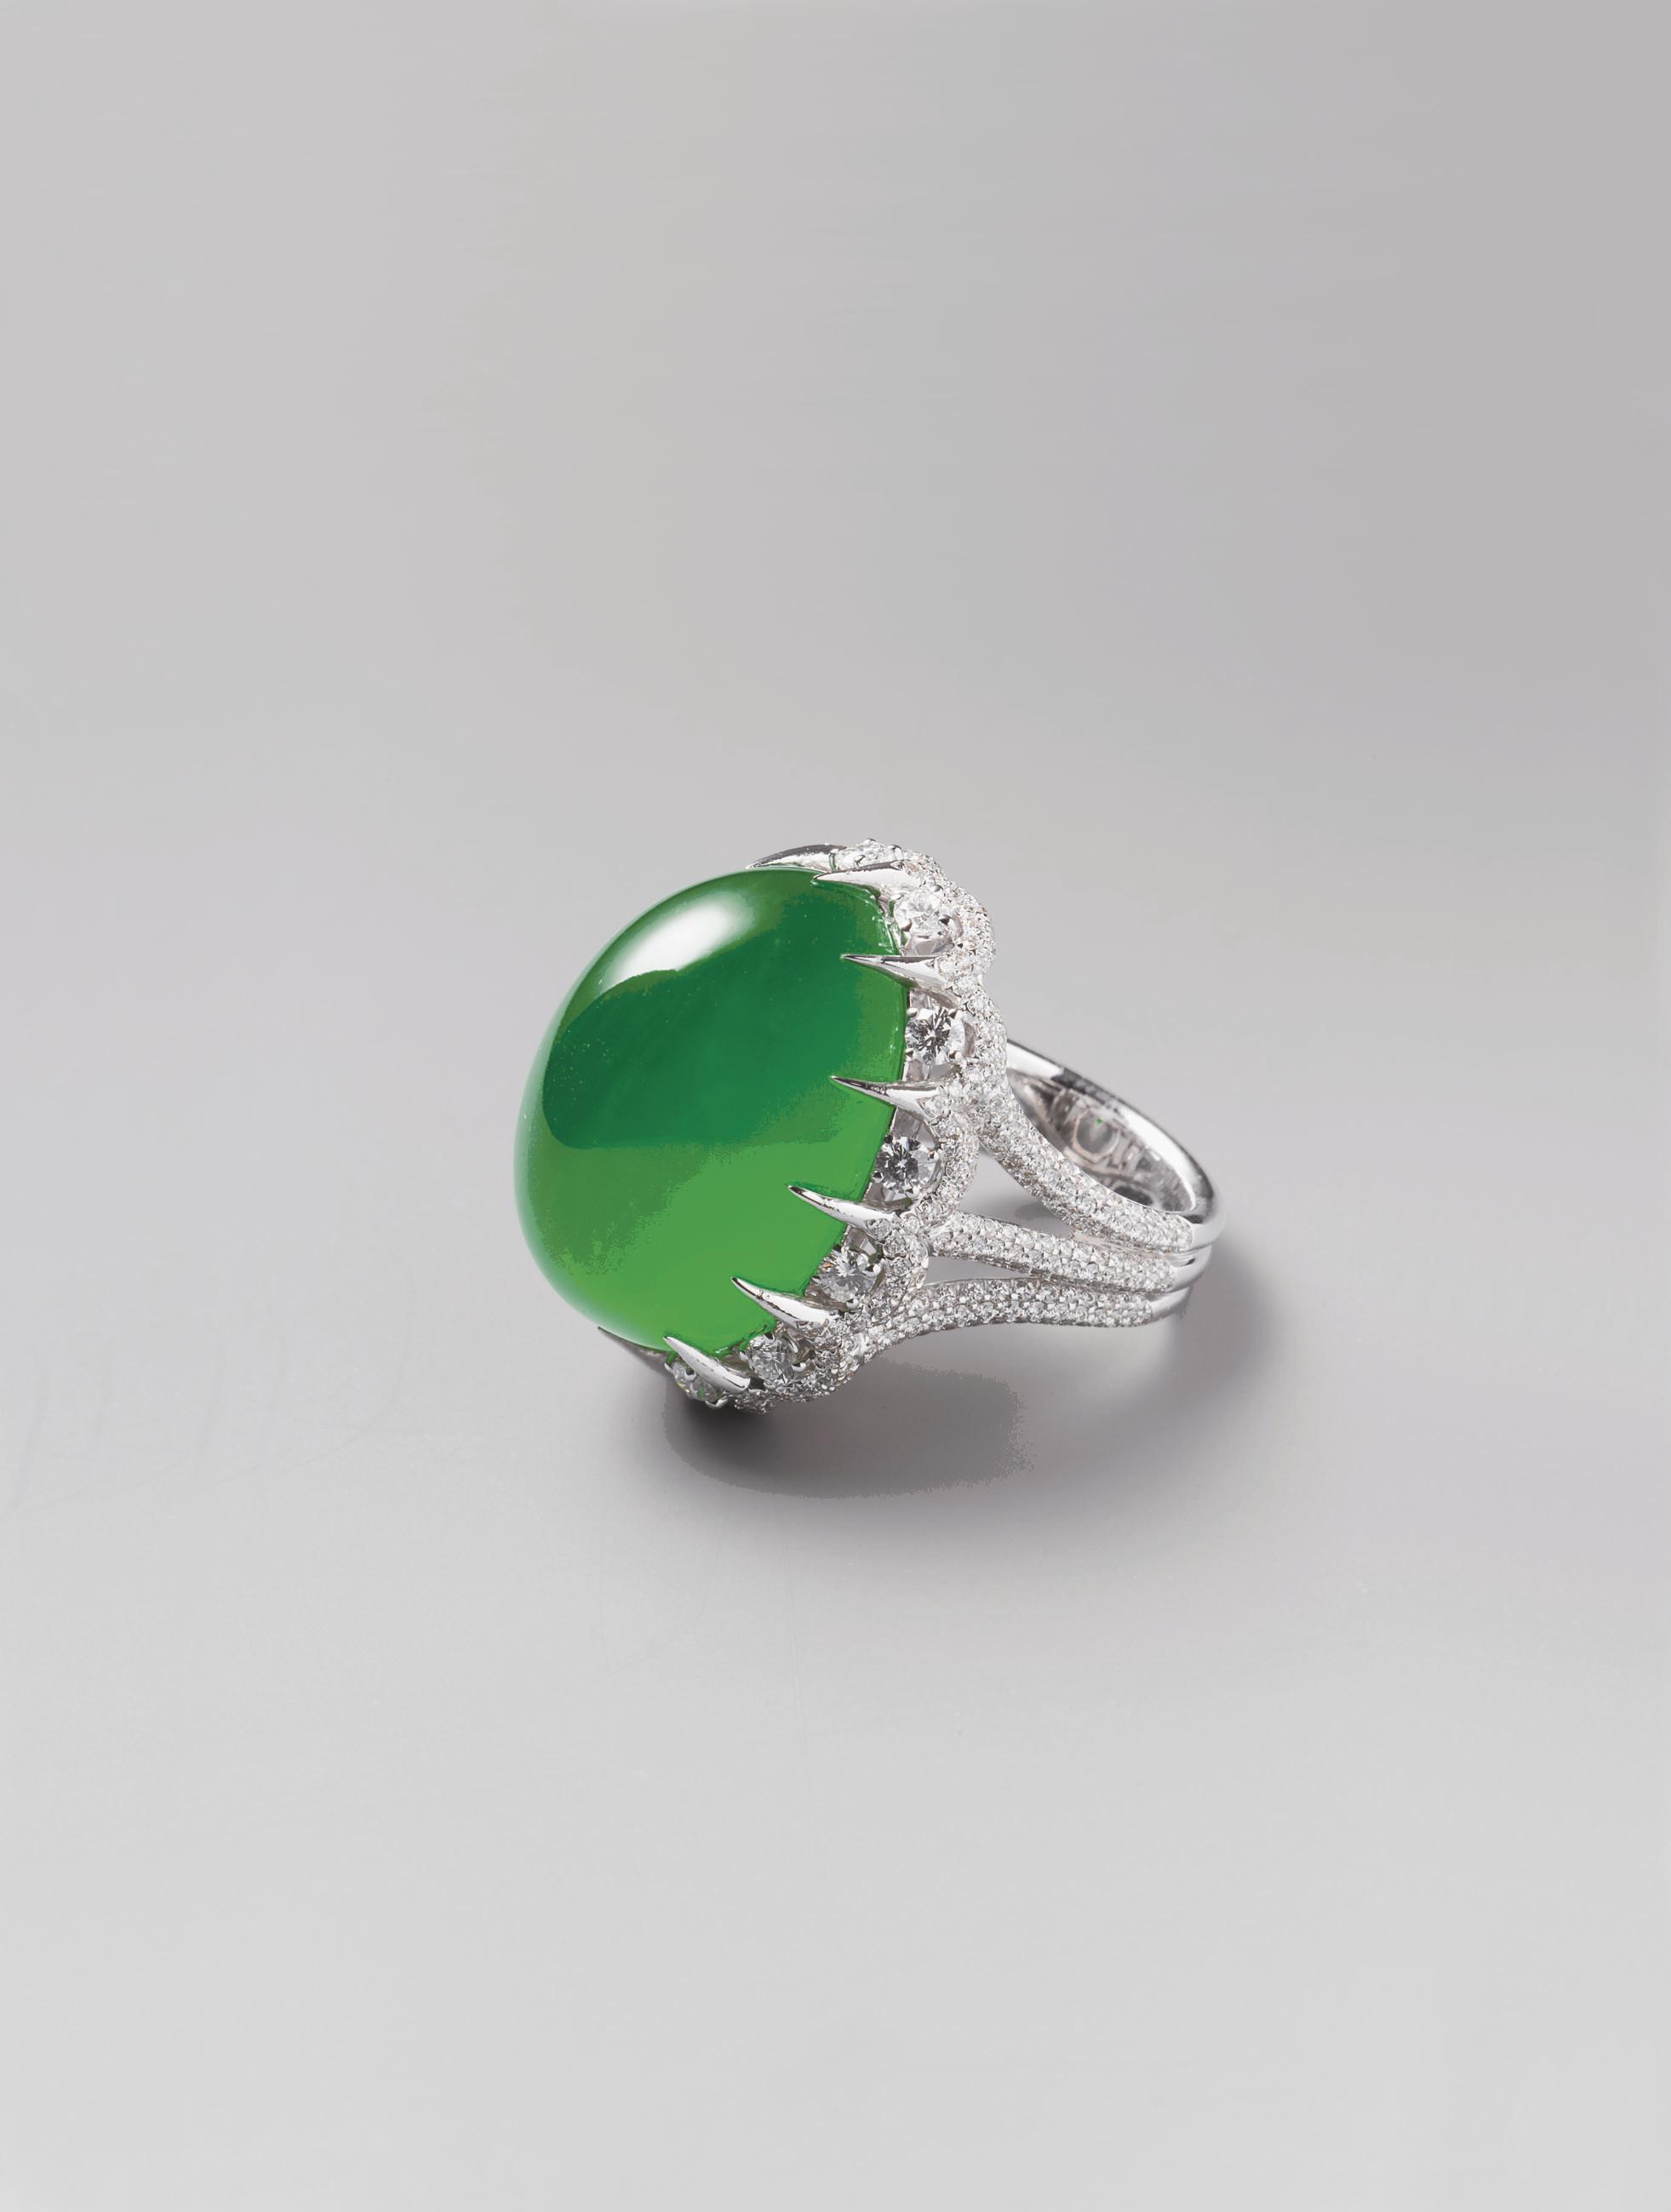 A JADEITE RING AND DIAMOND RIN